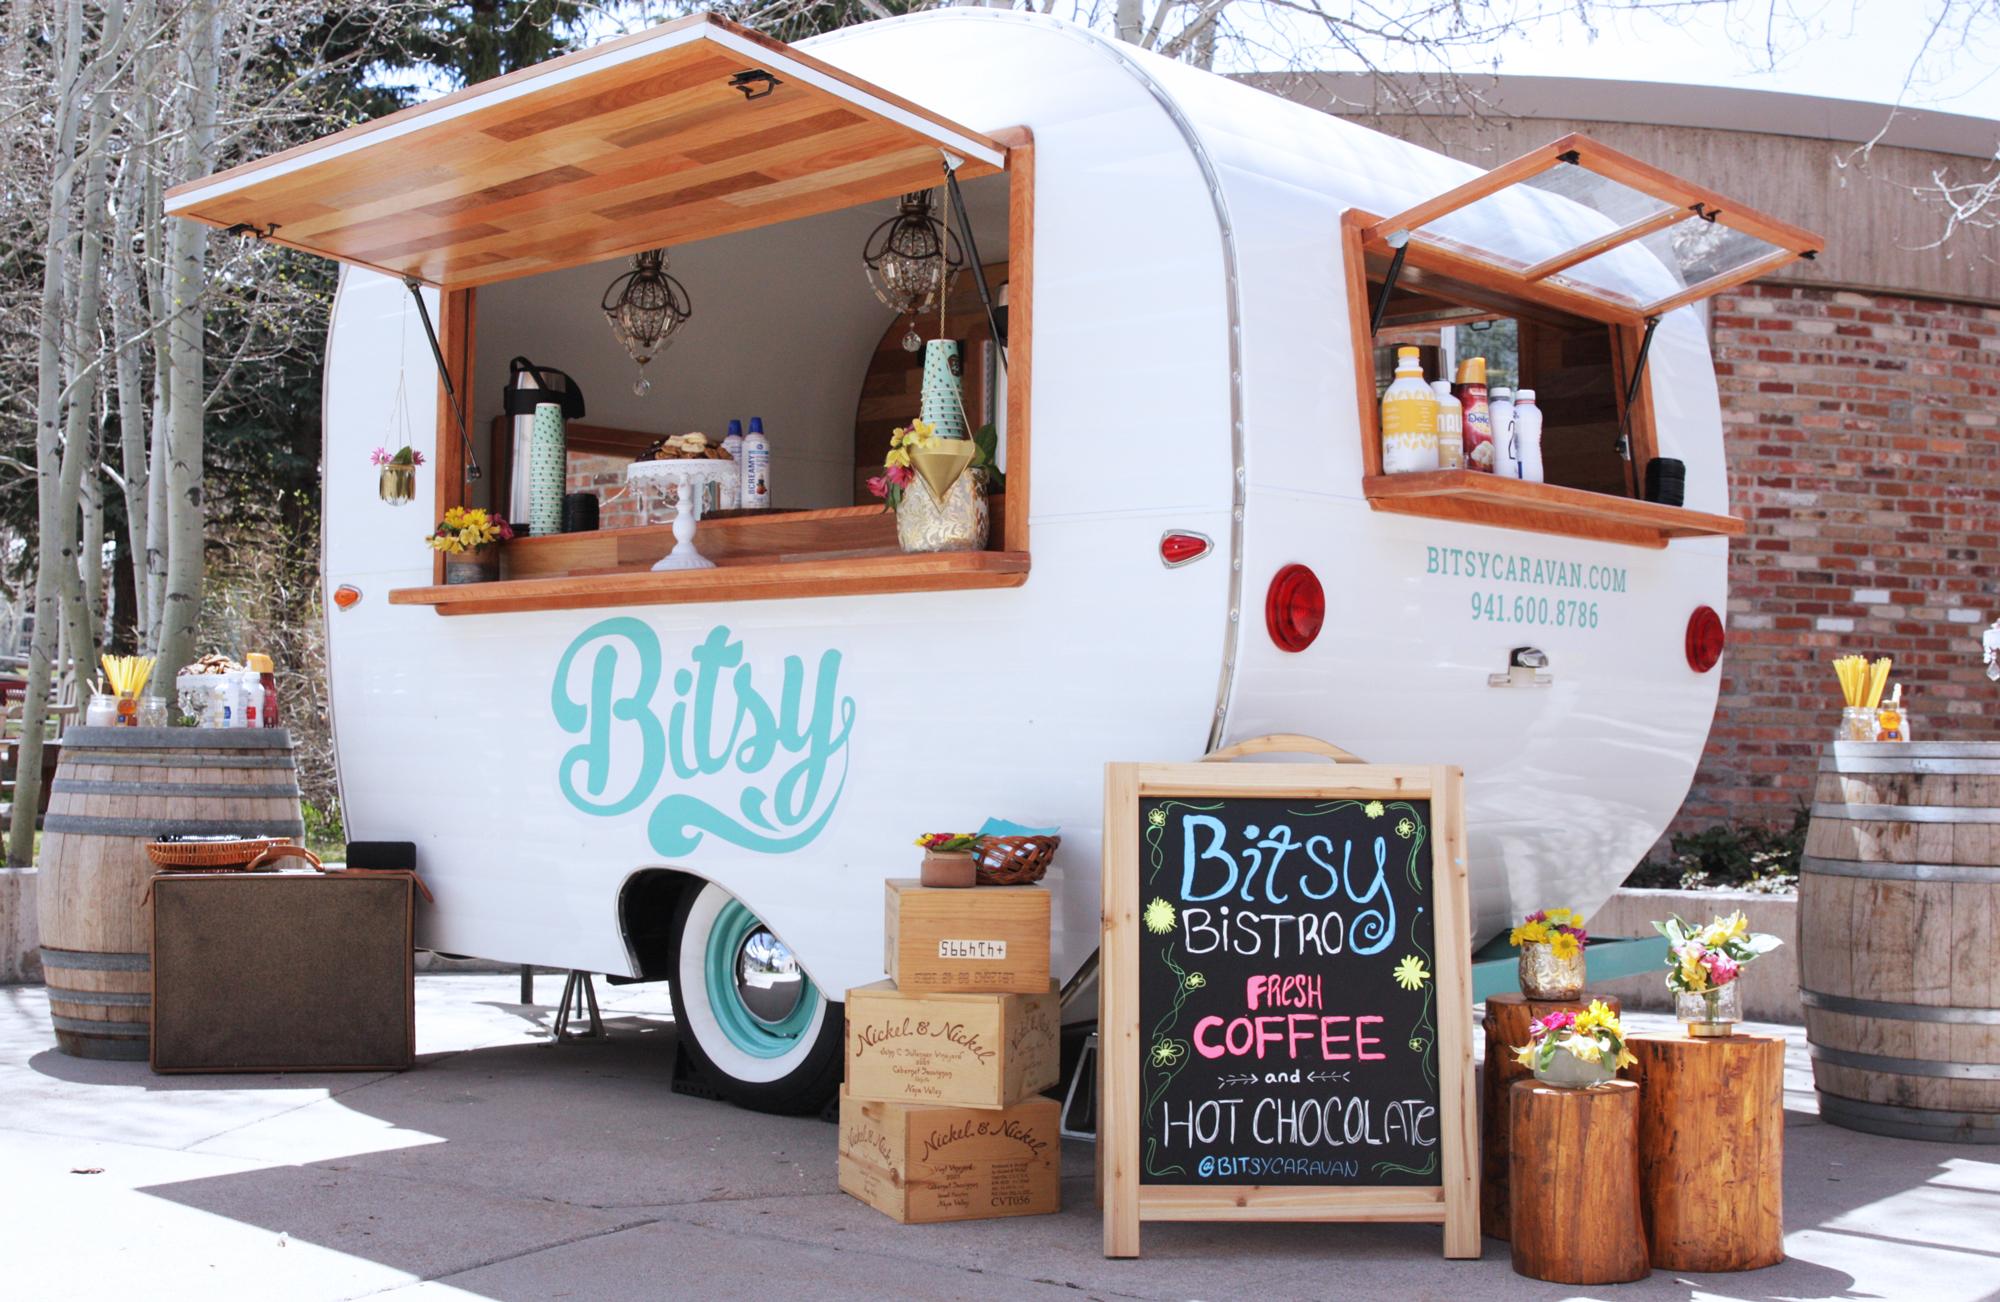 BITSY BISTRO - BITSY COFFEE & HOT CHOCOLATEAspen High SchoolAspen, Colorado